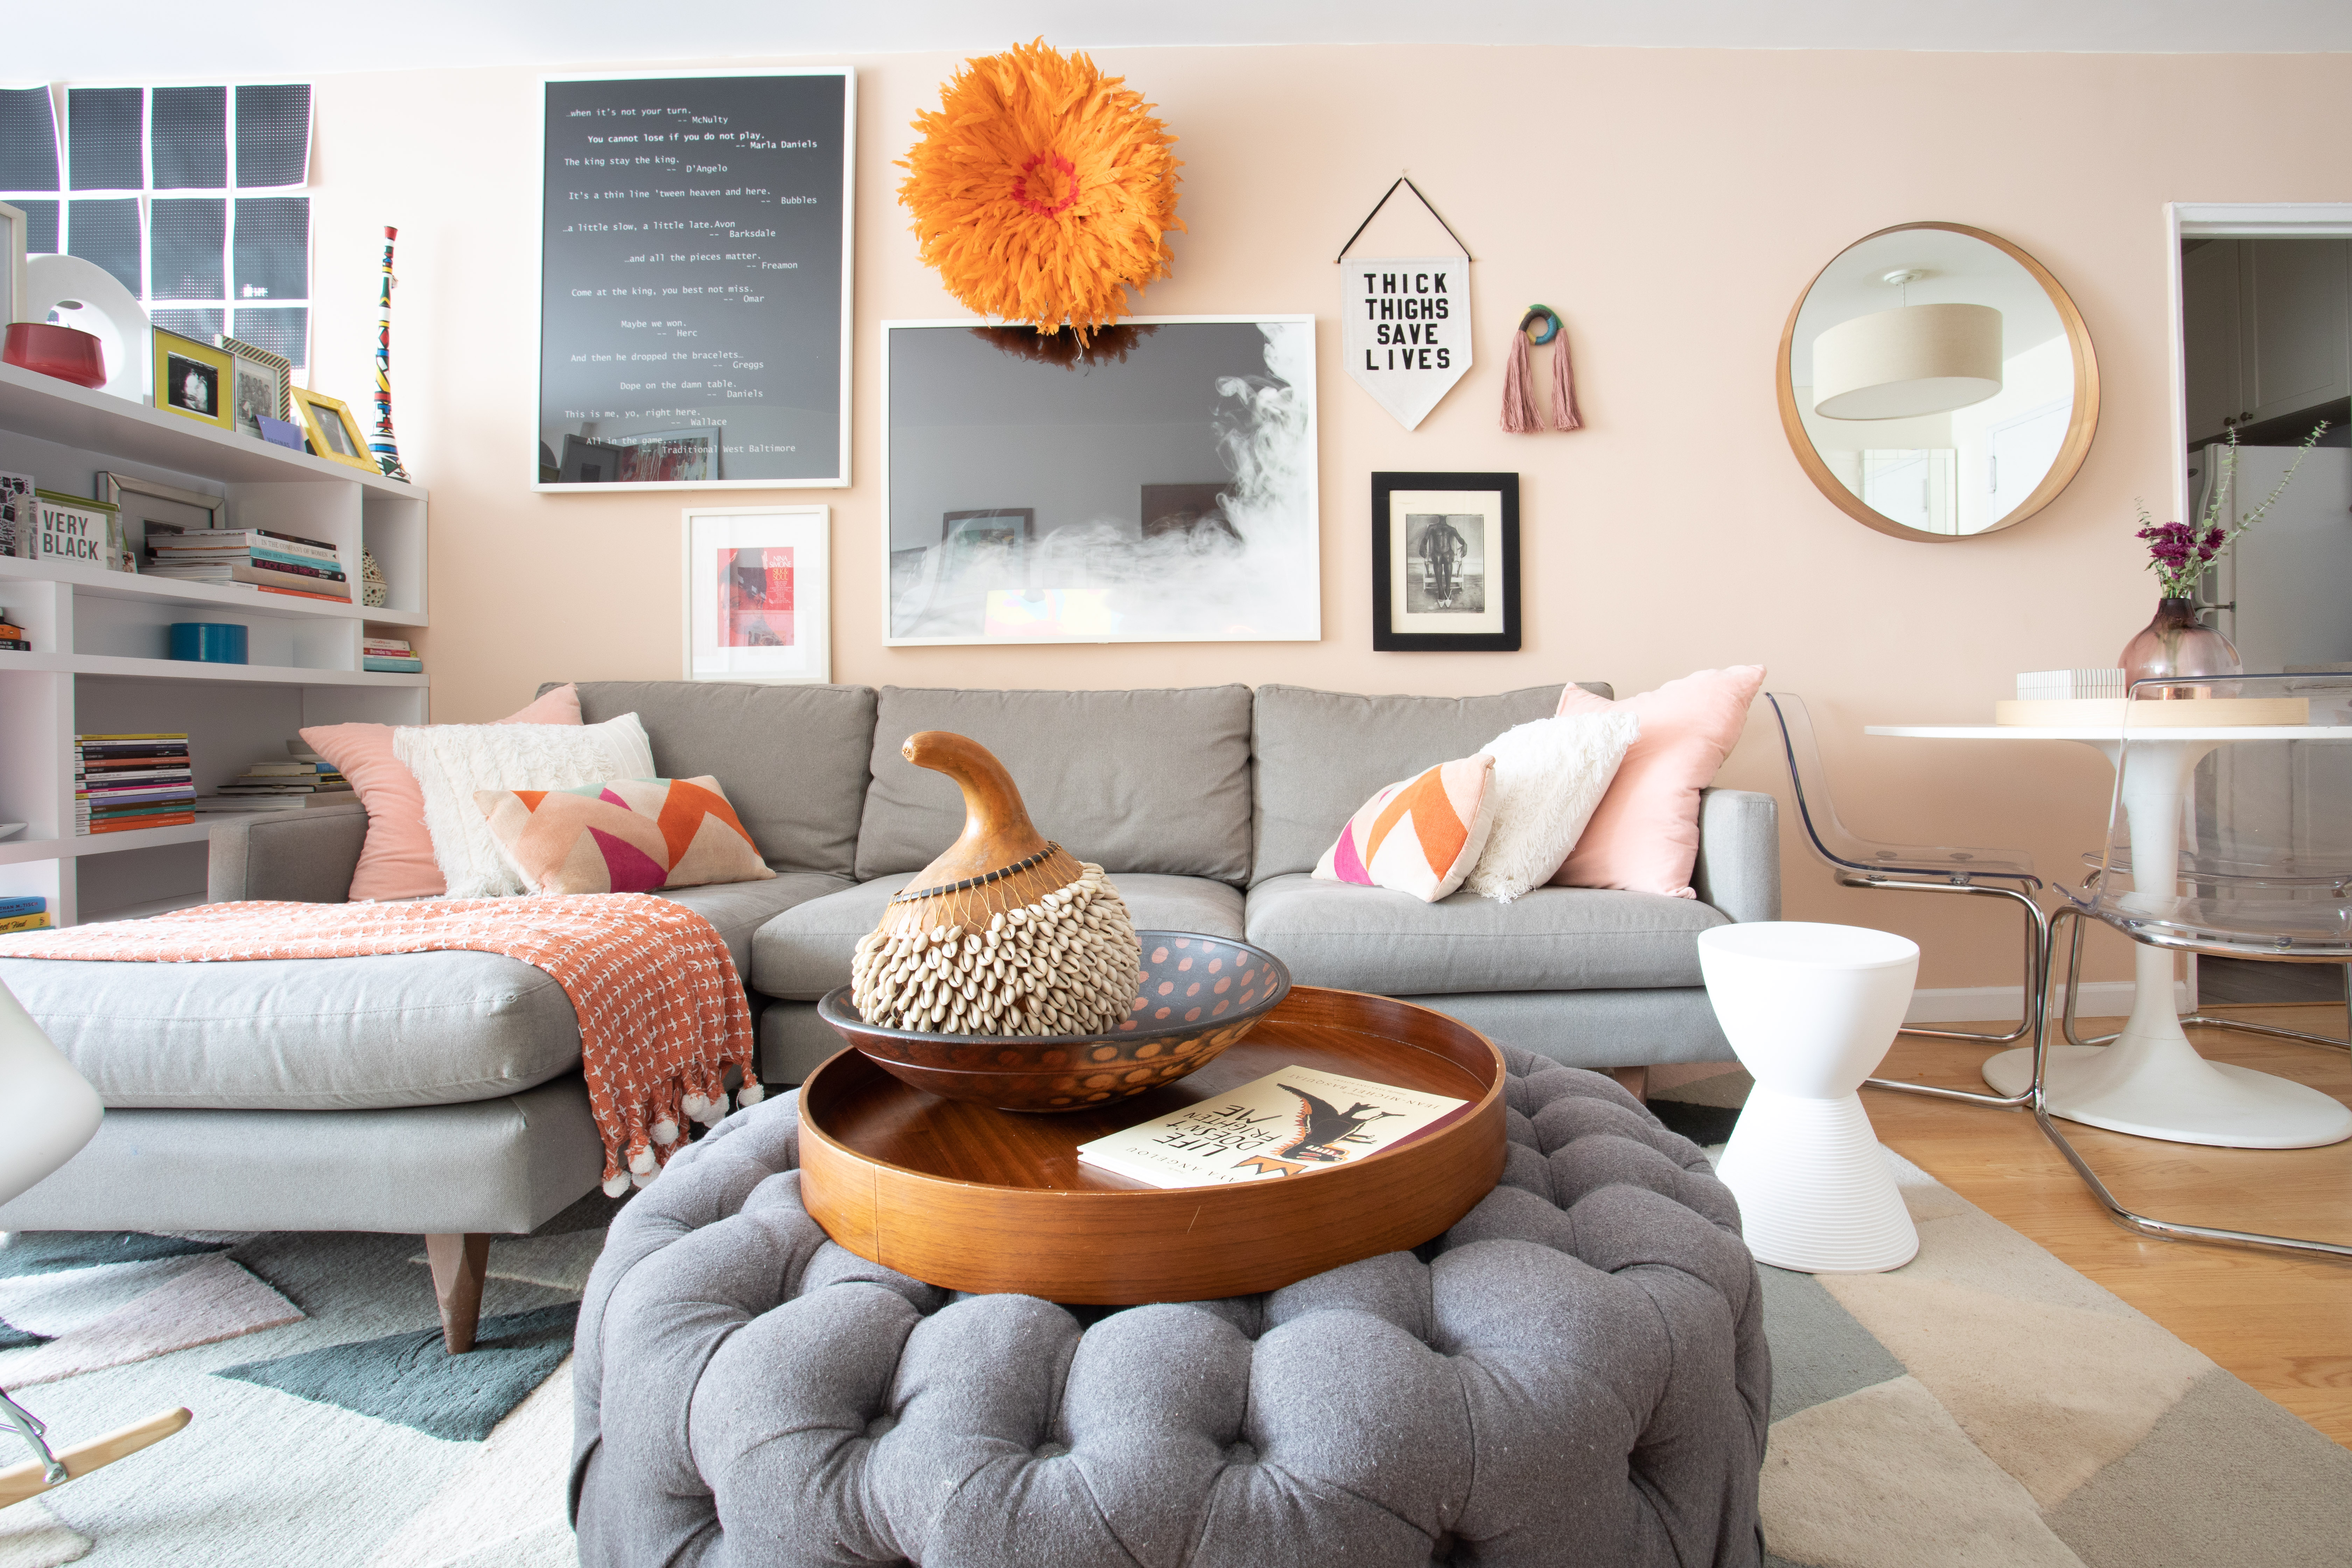 The Best Interior Design Hacks For Design Amatuers Apartment Therapy